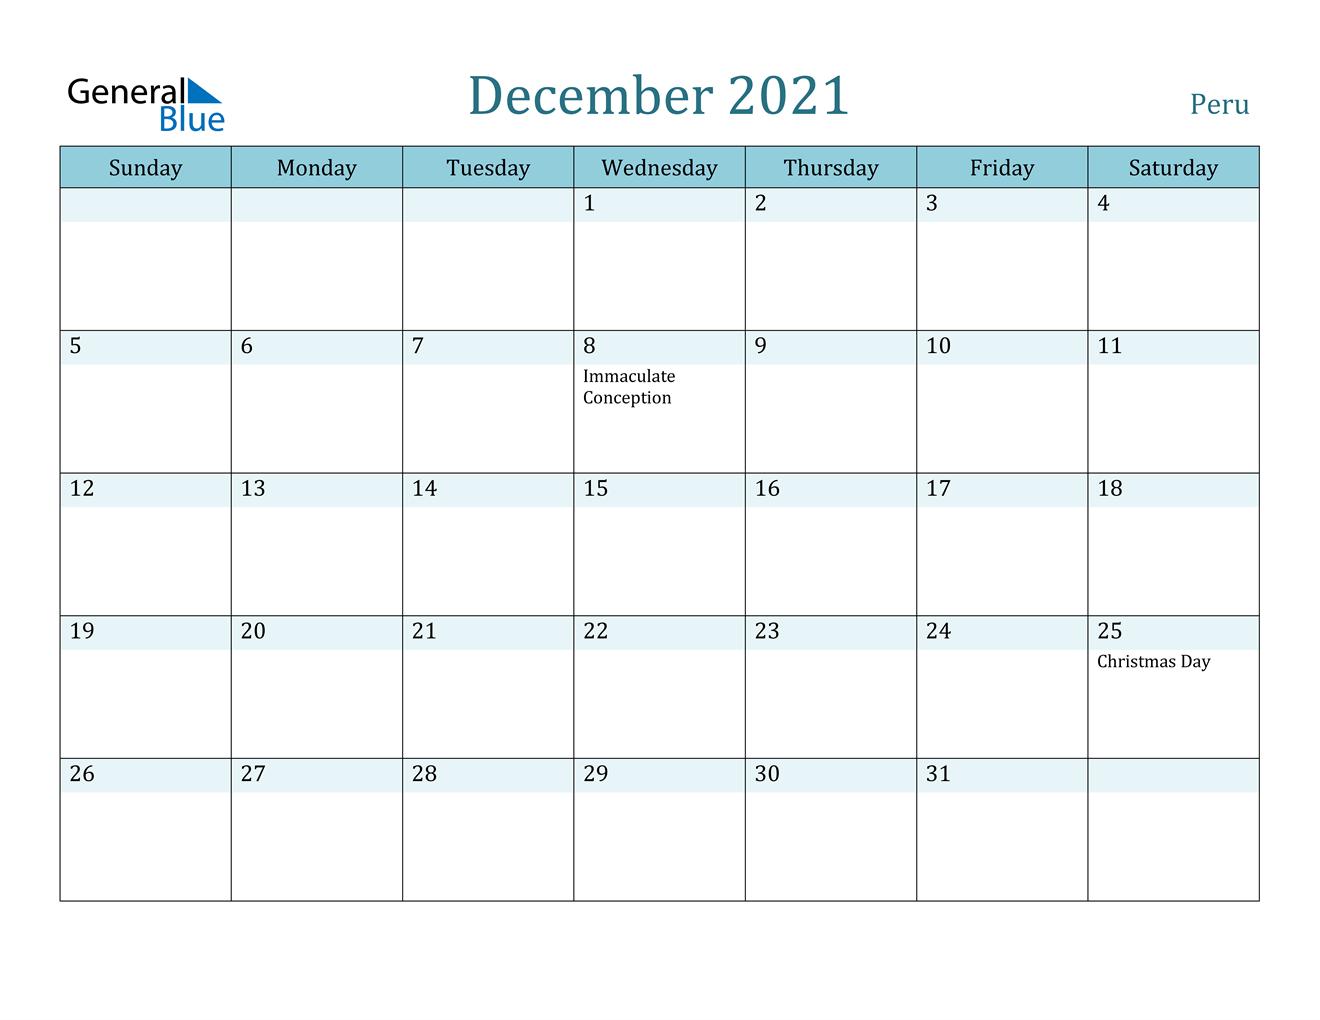 December 2021 Calendar - Peru